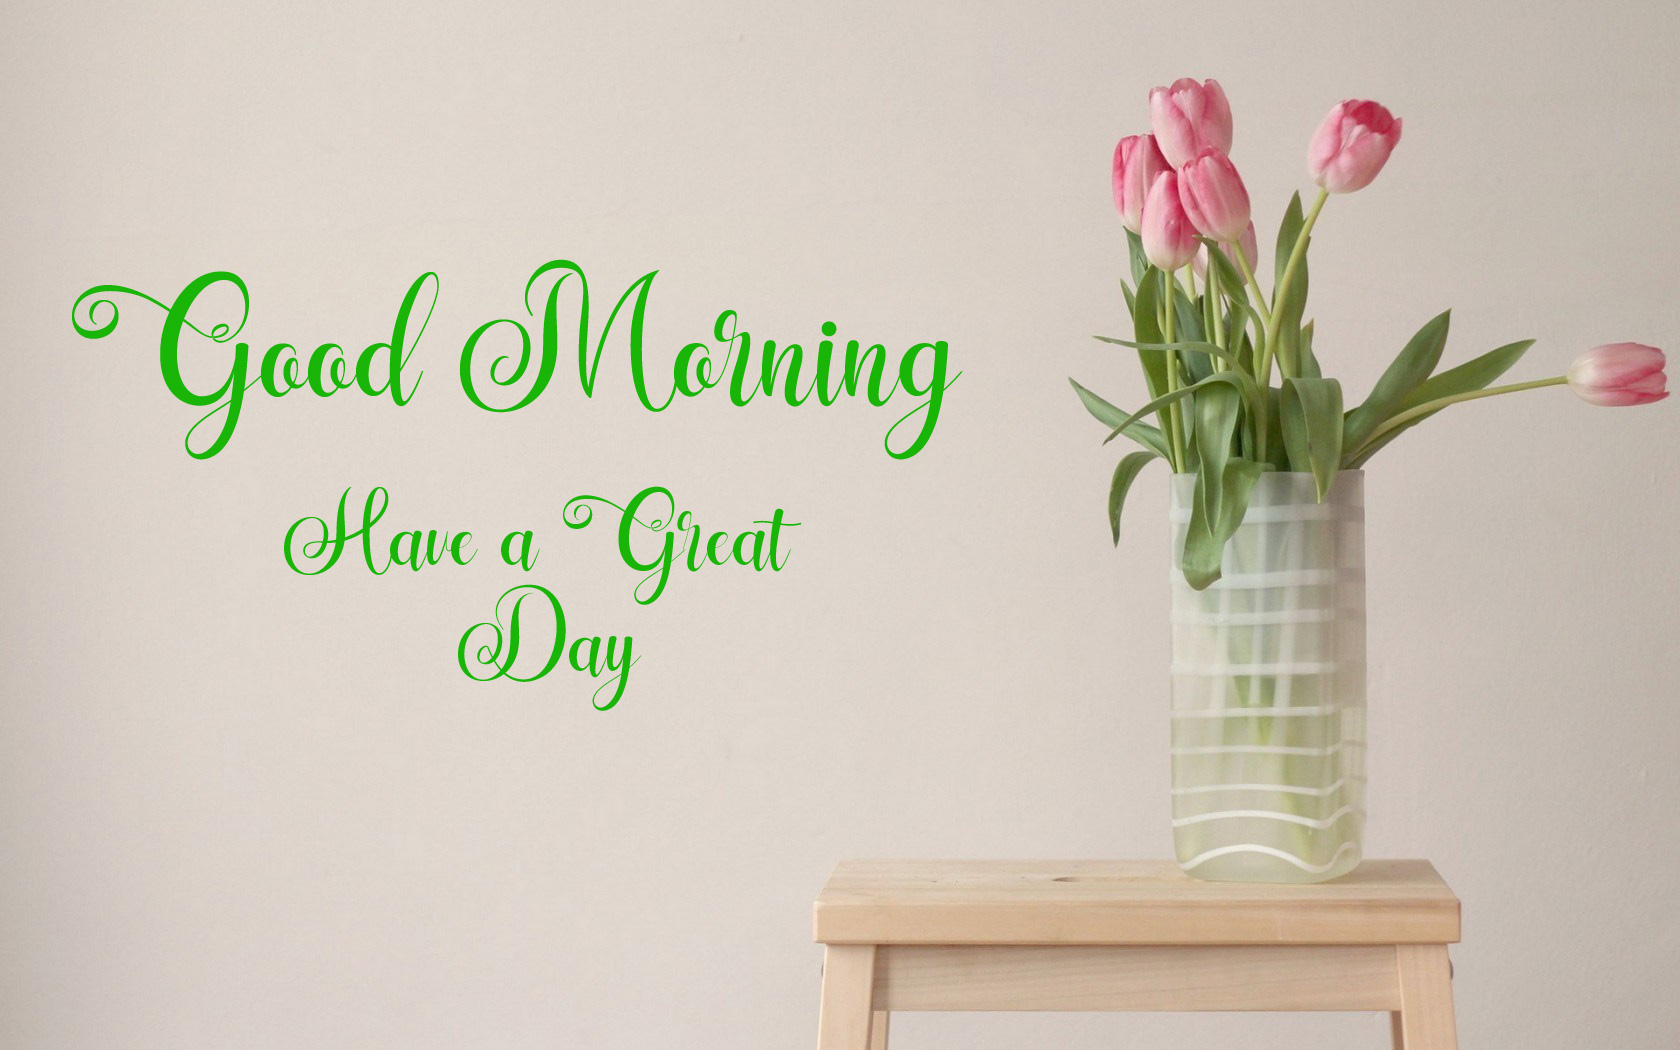 nice good morning images wallpaper download 1